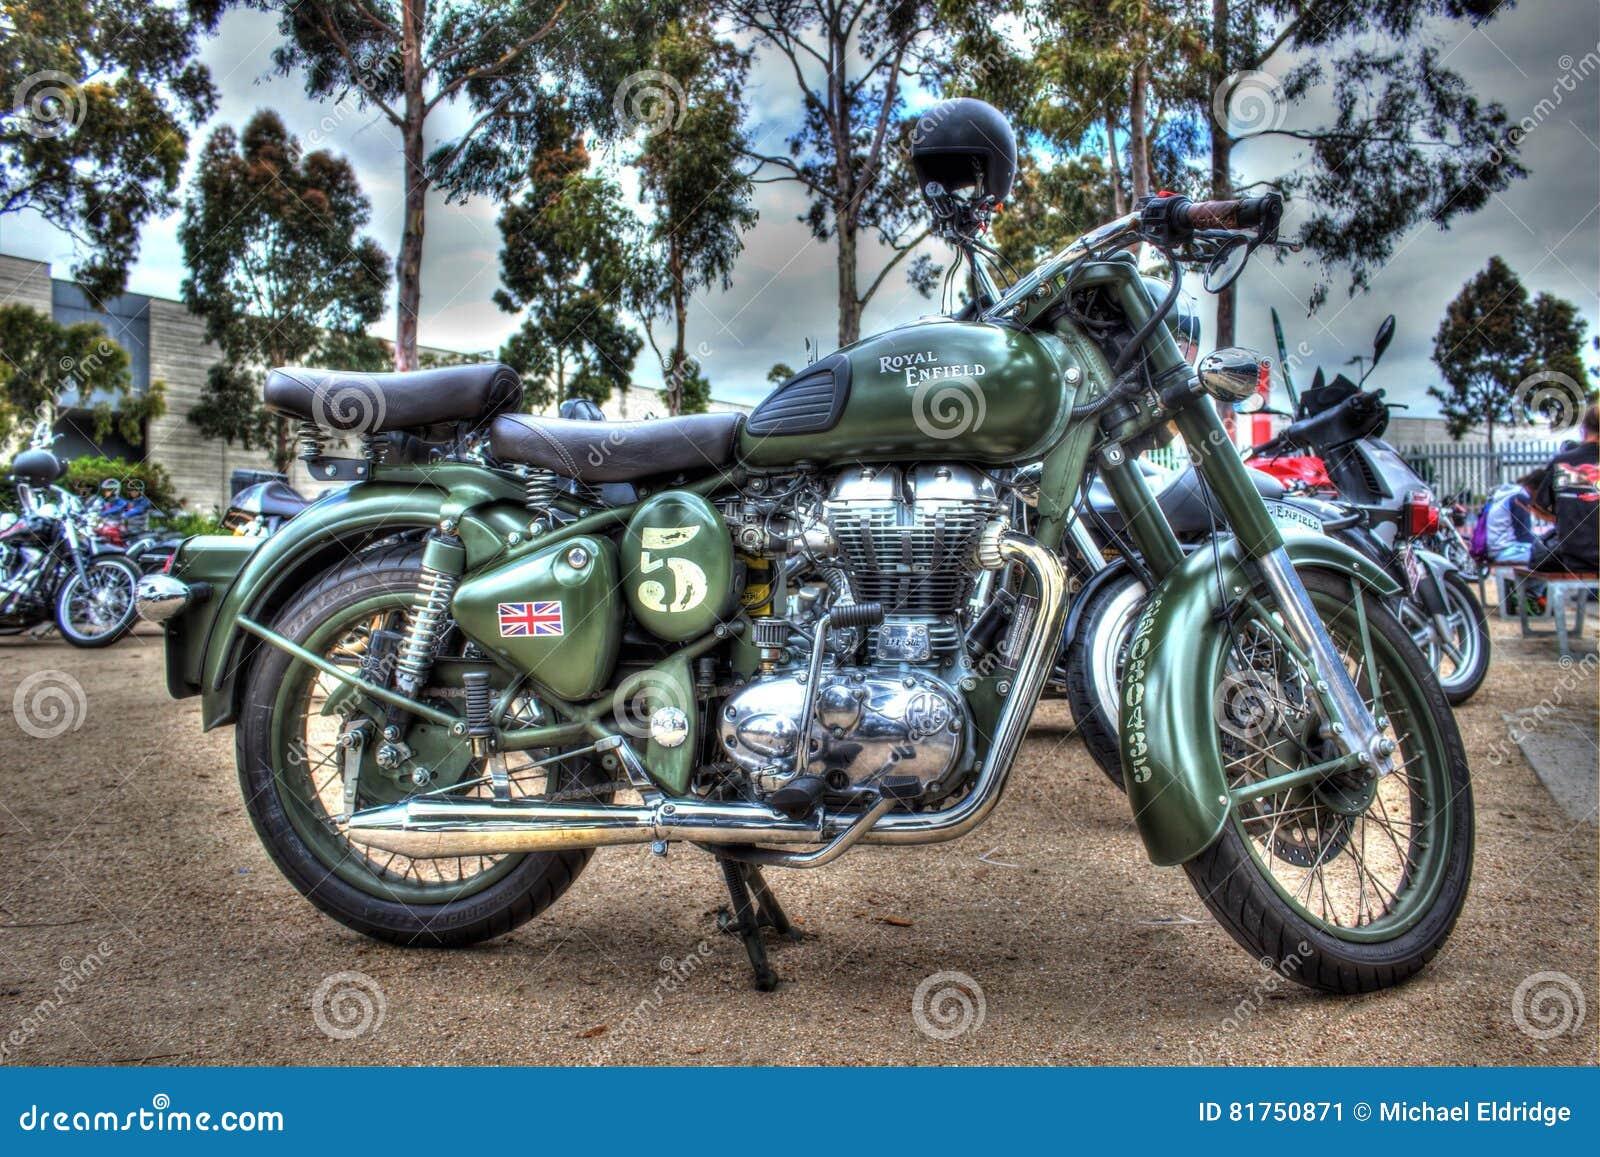 Classic English Built Royal Enfield Motorcycle Editorial ...